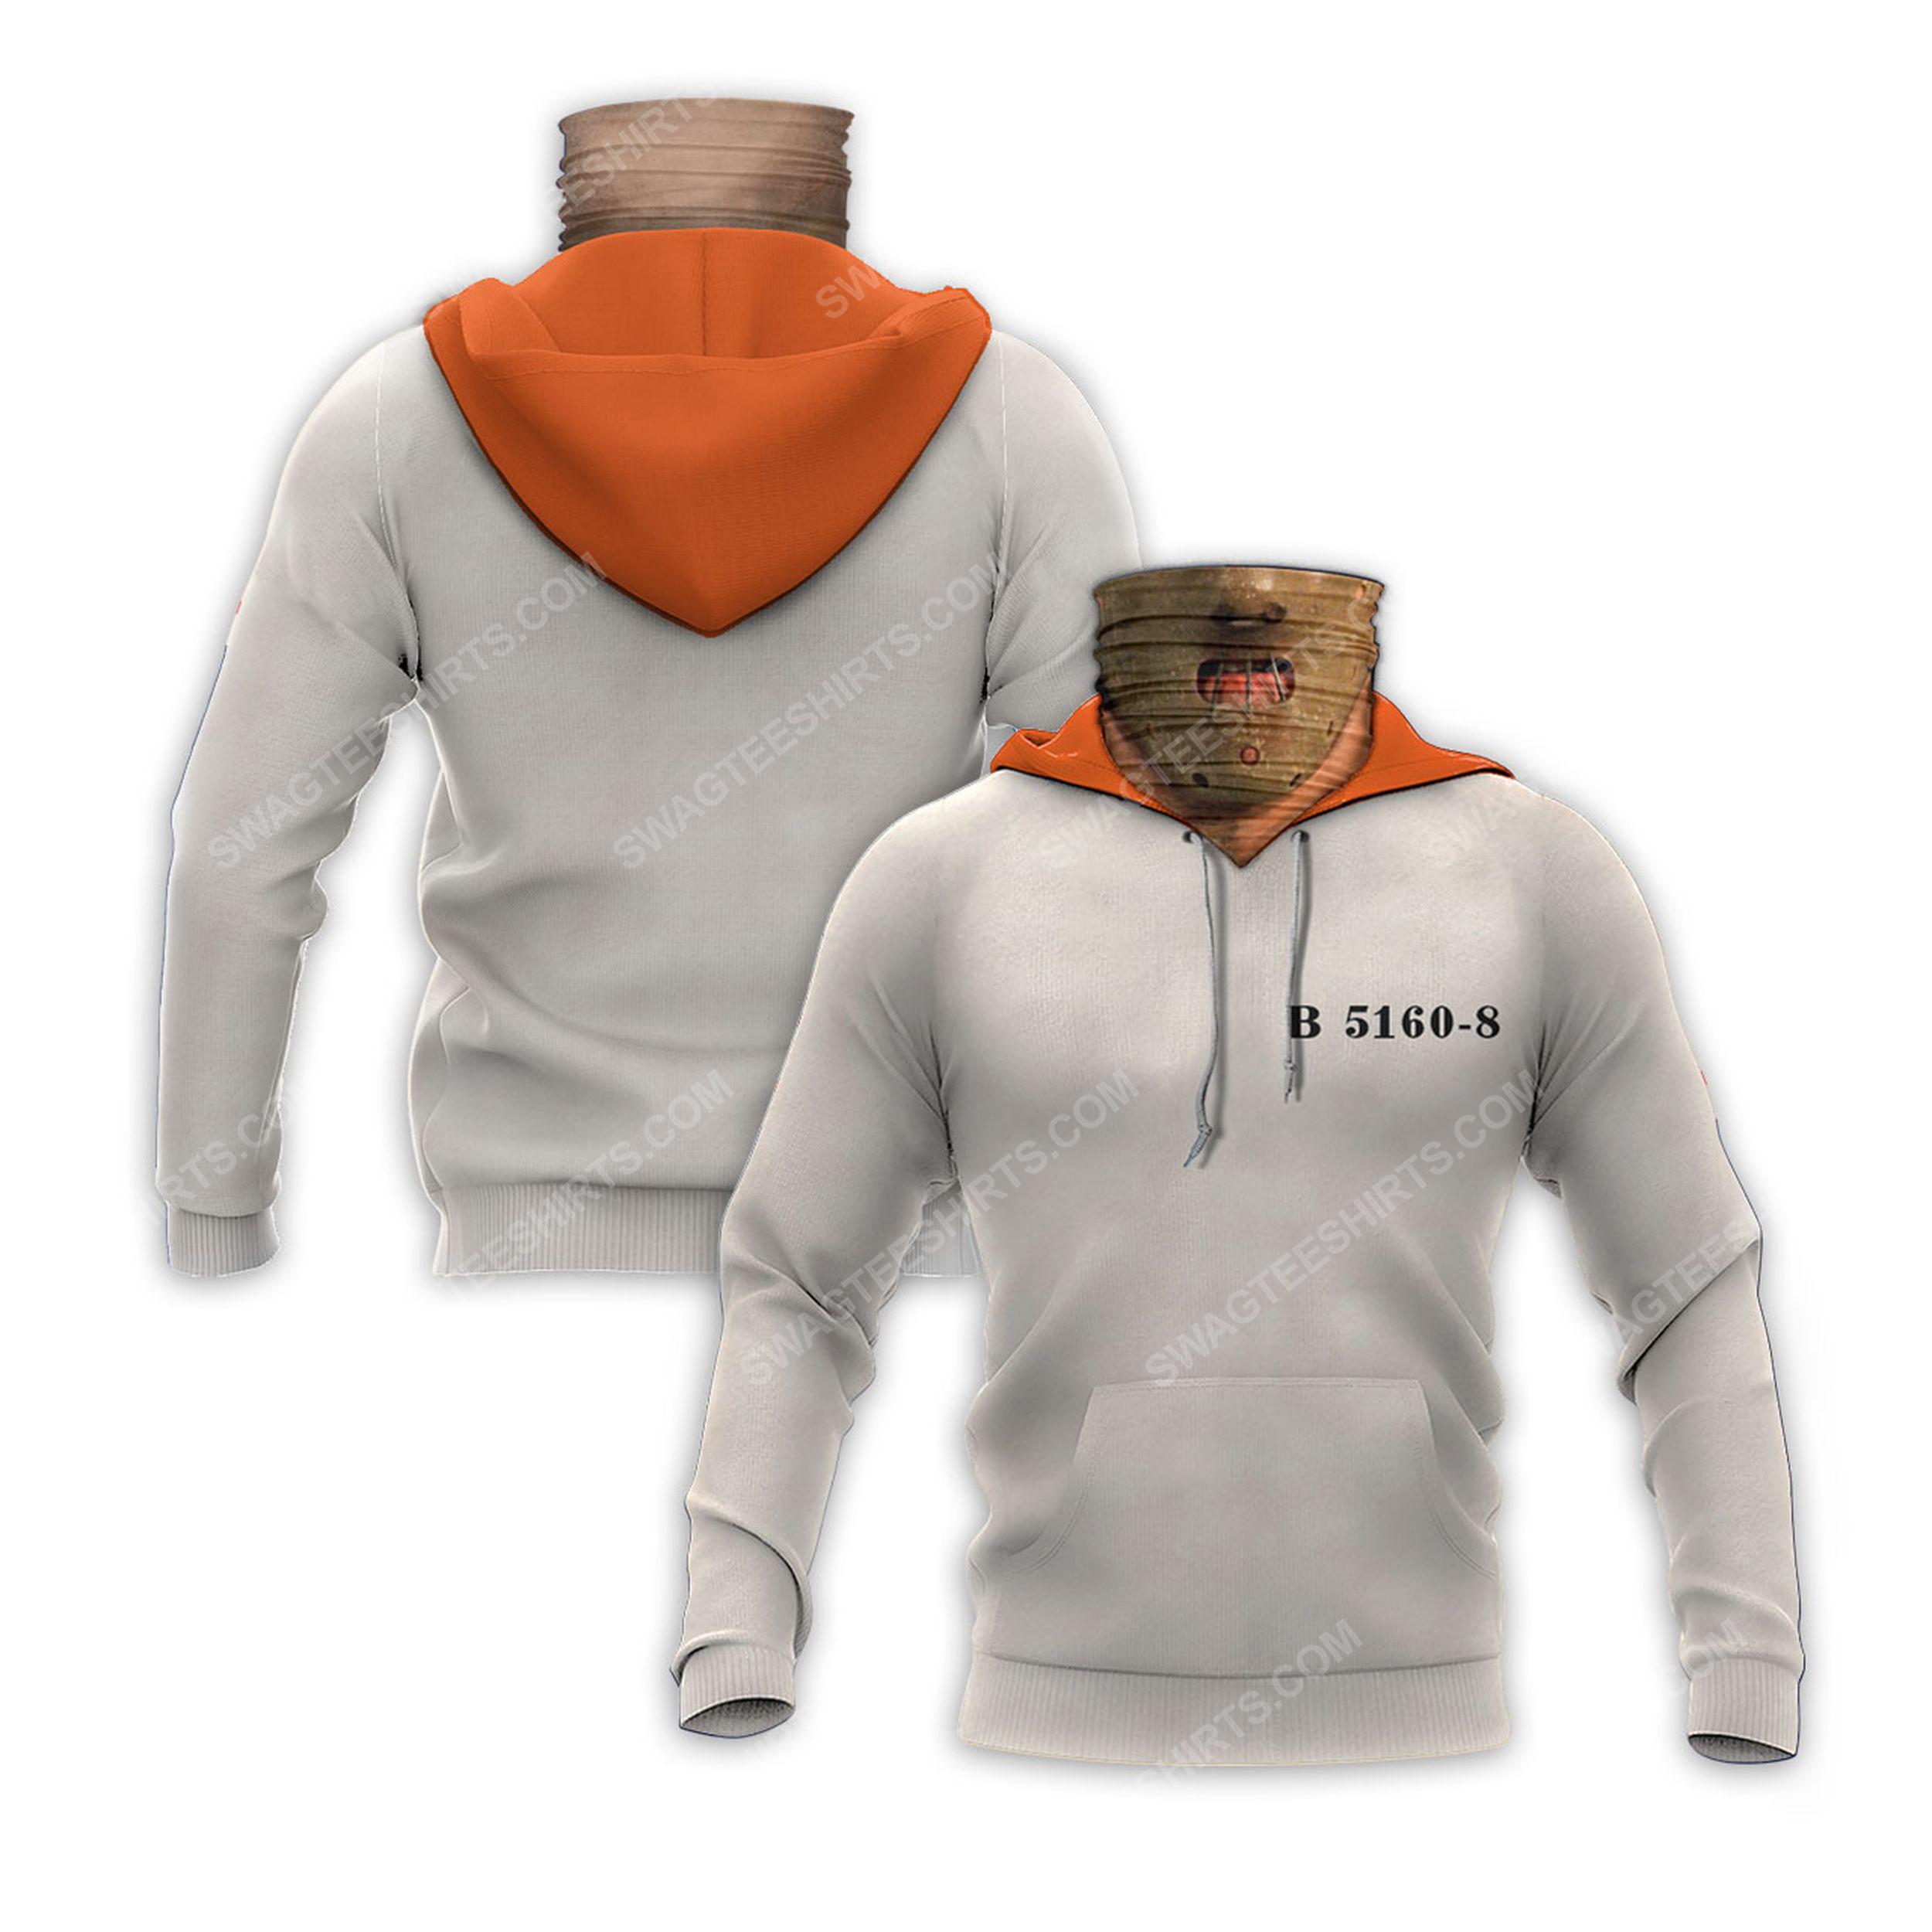 Horror movie hannibal lecter for halloween full print mask hoodie 2(1) - Copy